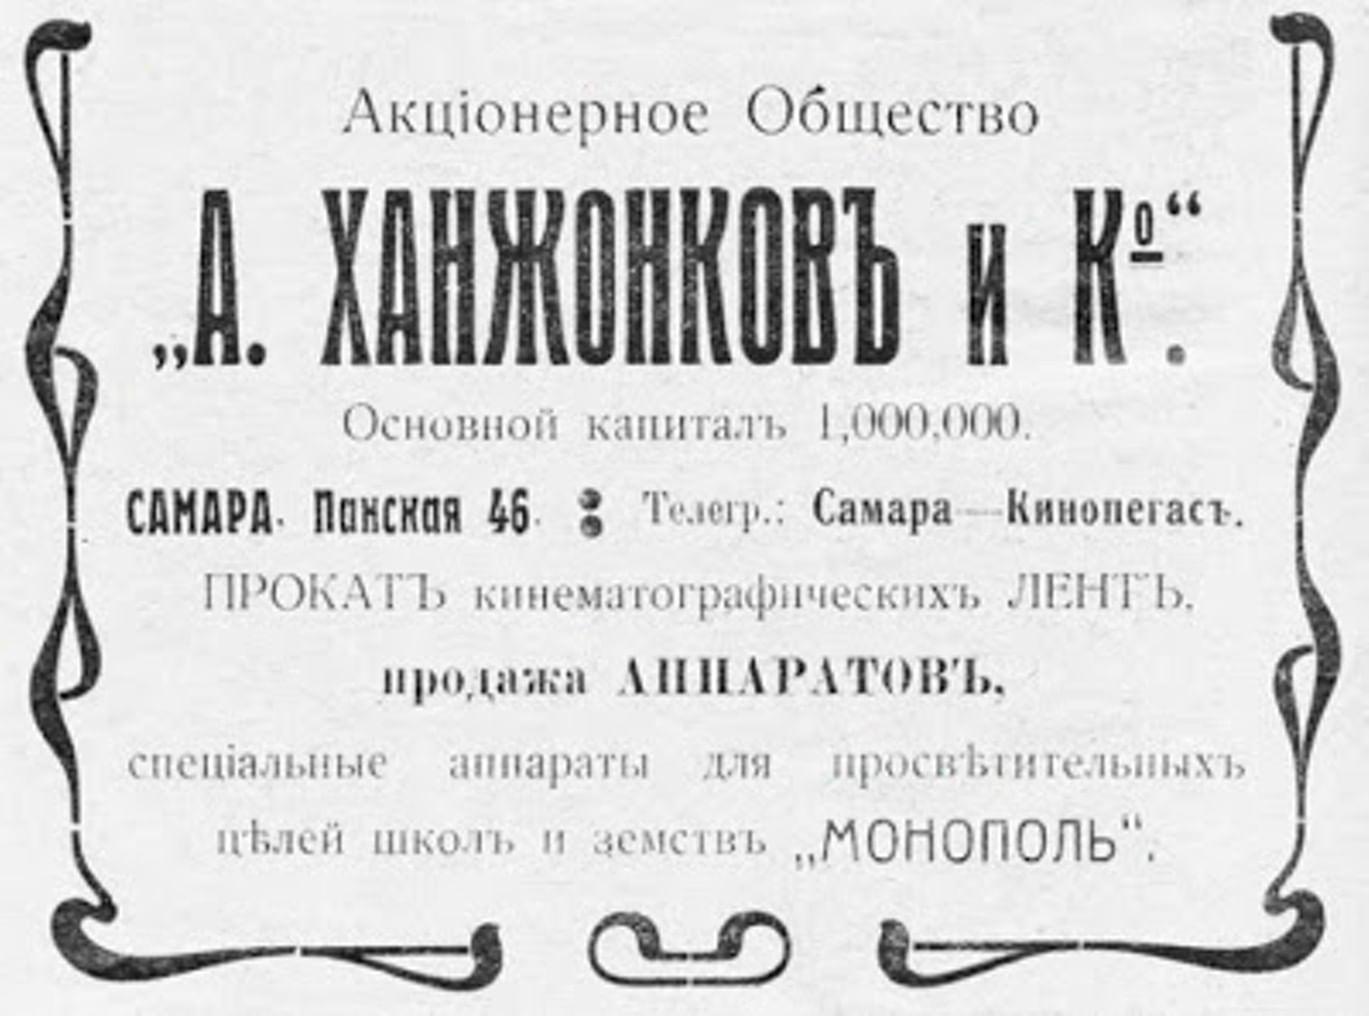 Александр Ханжонков 2